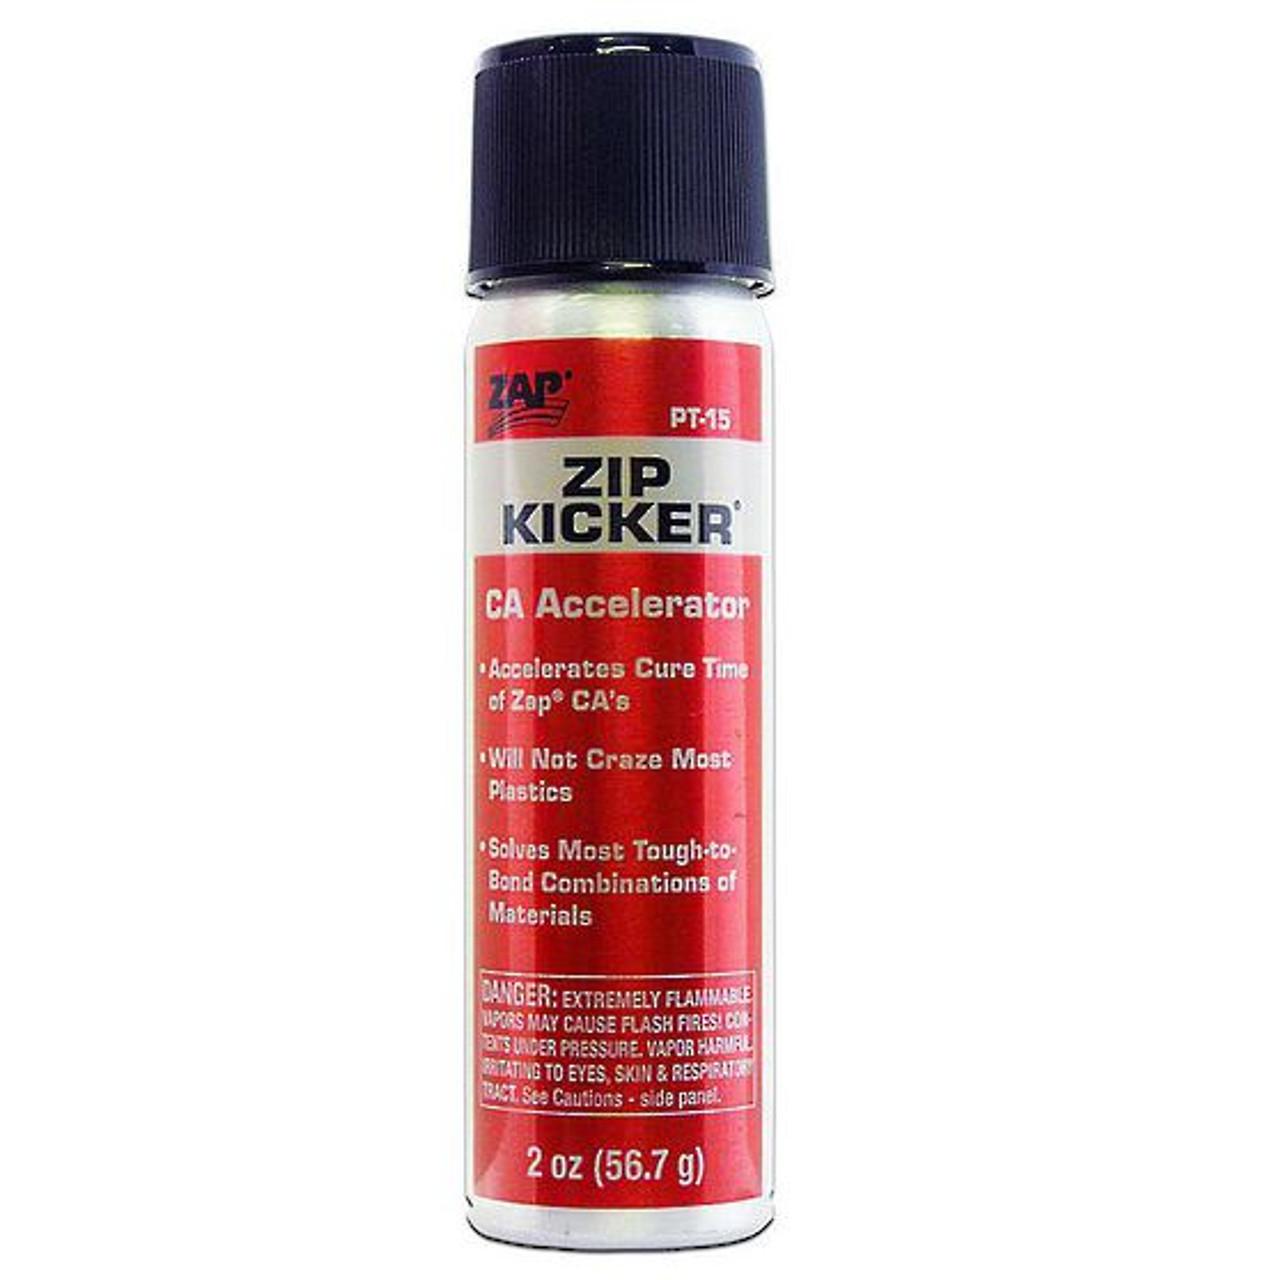 ZAP PT15 Zip Kicker CA Glue Accelerator Spray 56 7g